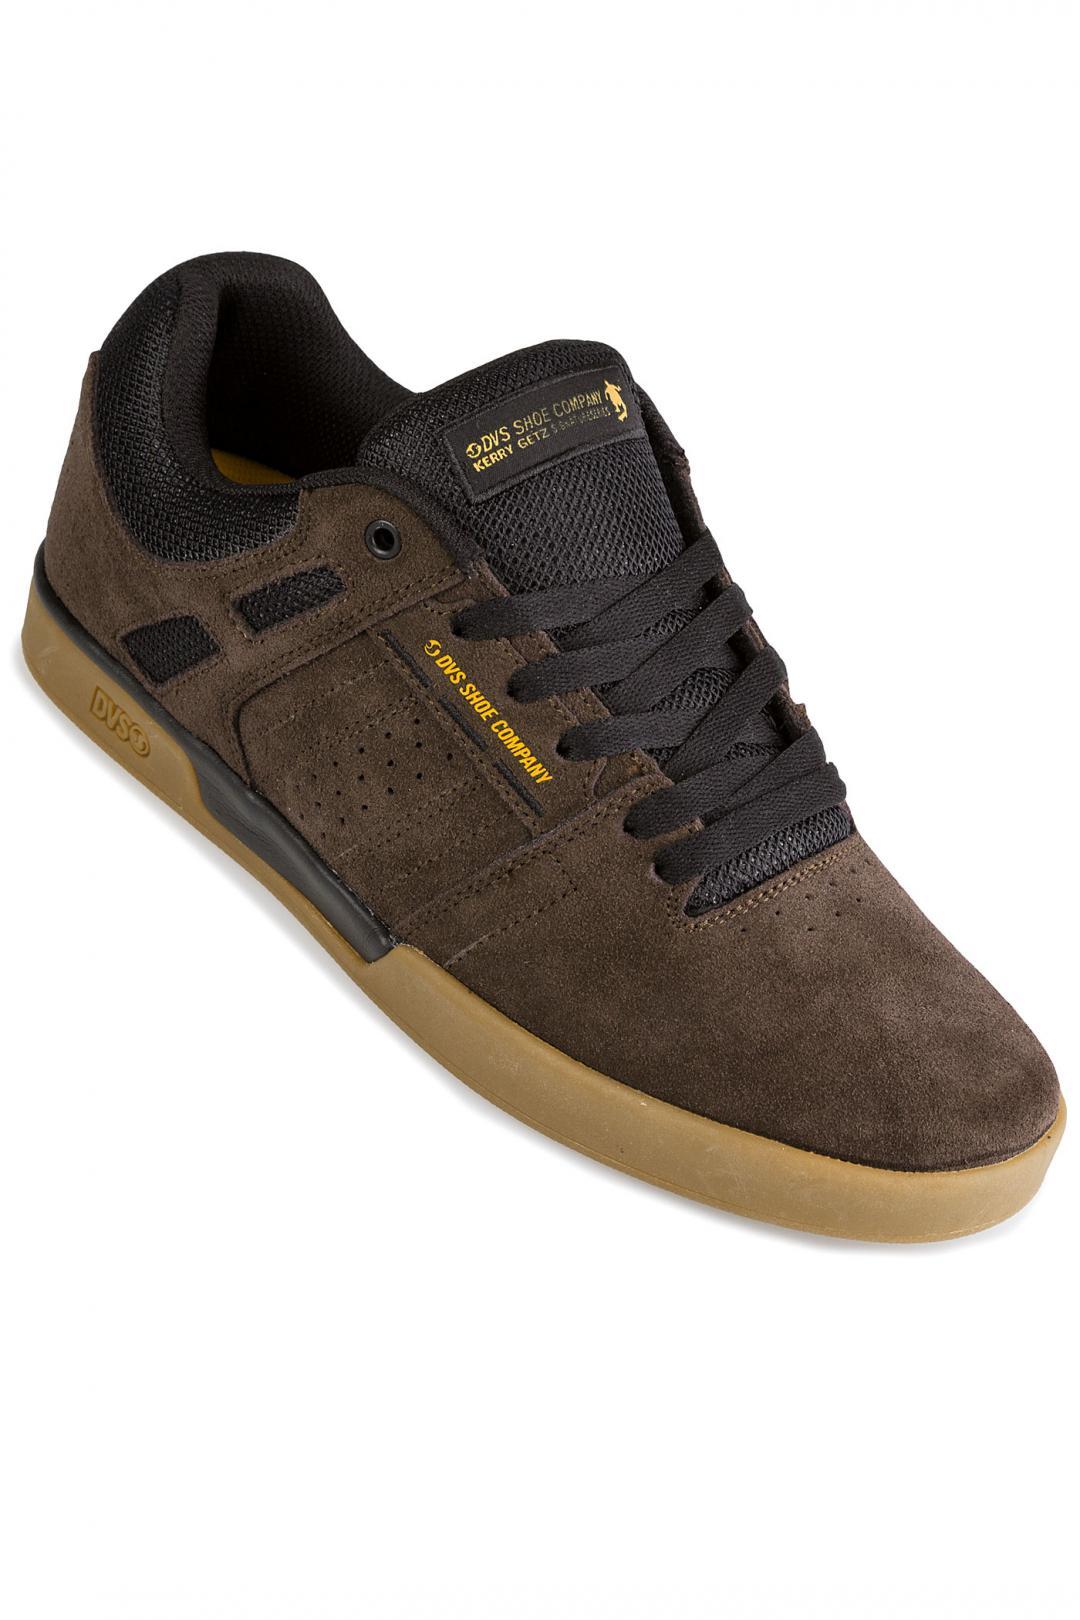 Uomo DVS Drift+ Suede chocolate brown black   Sneaker